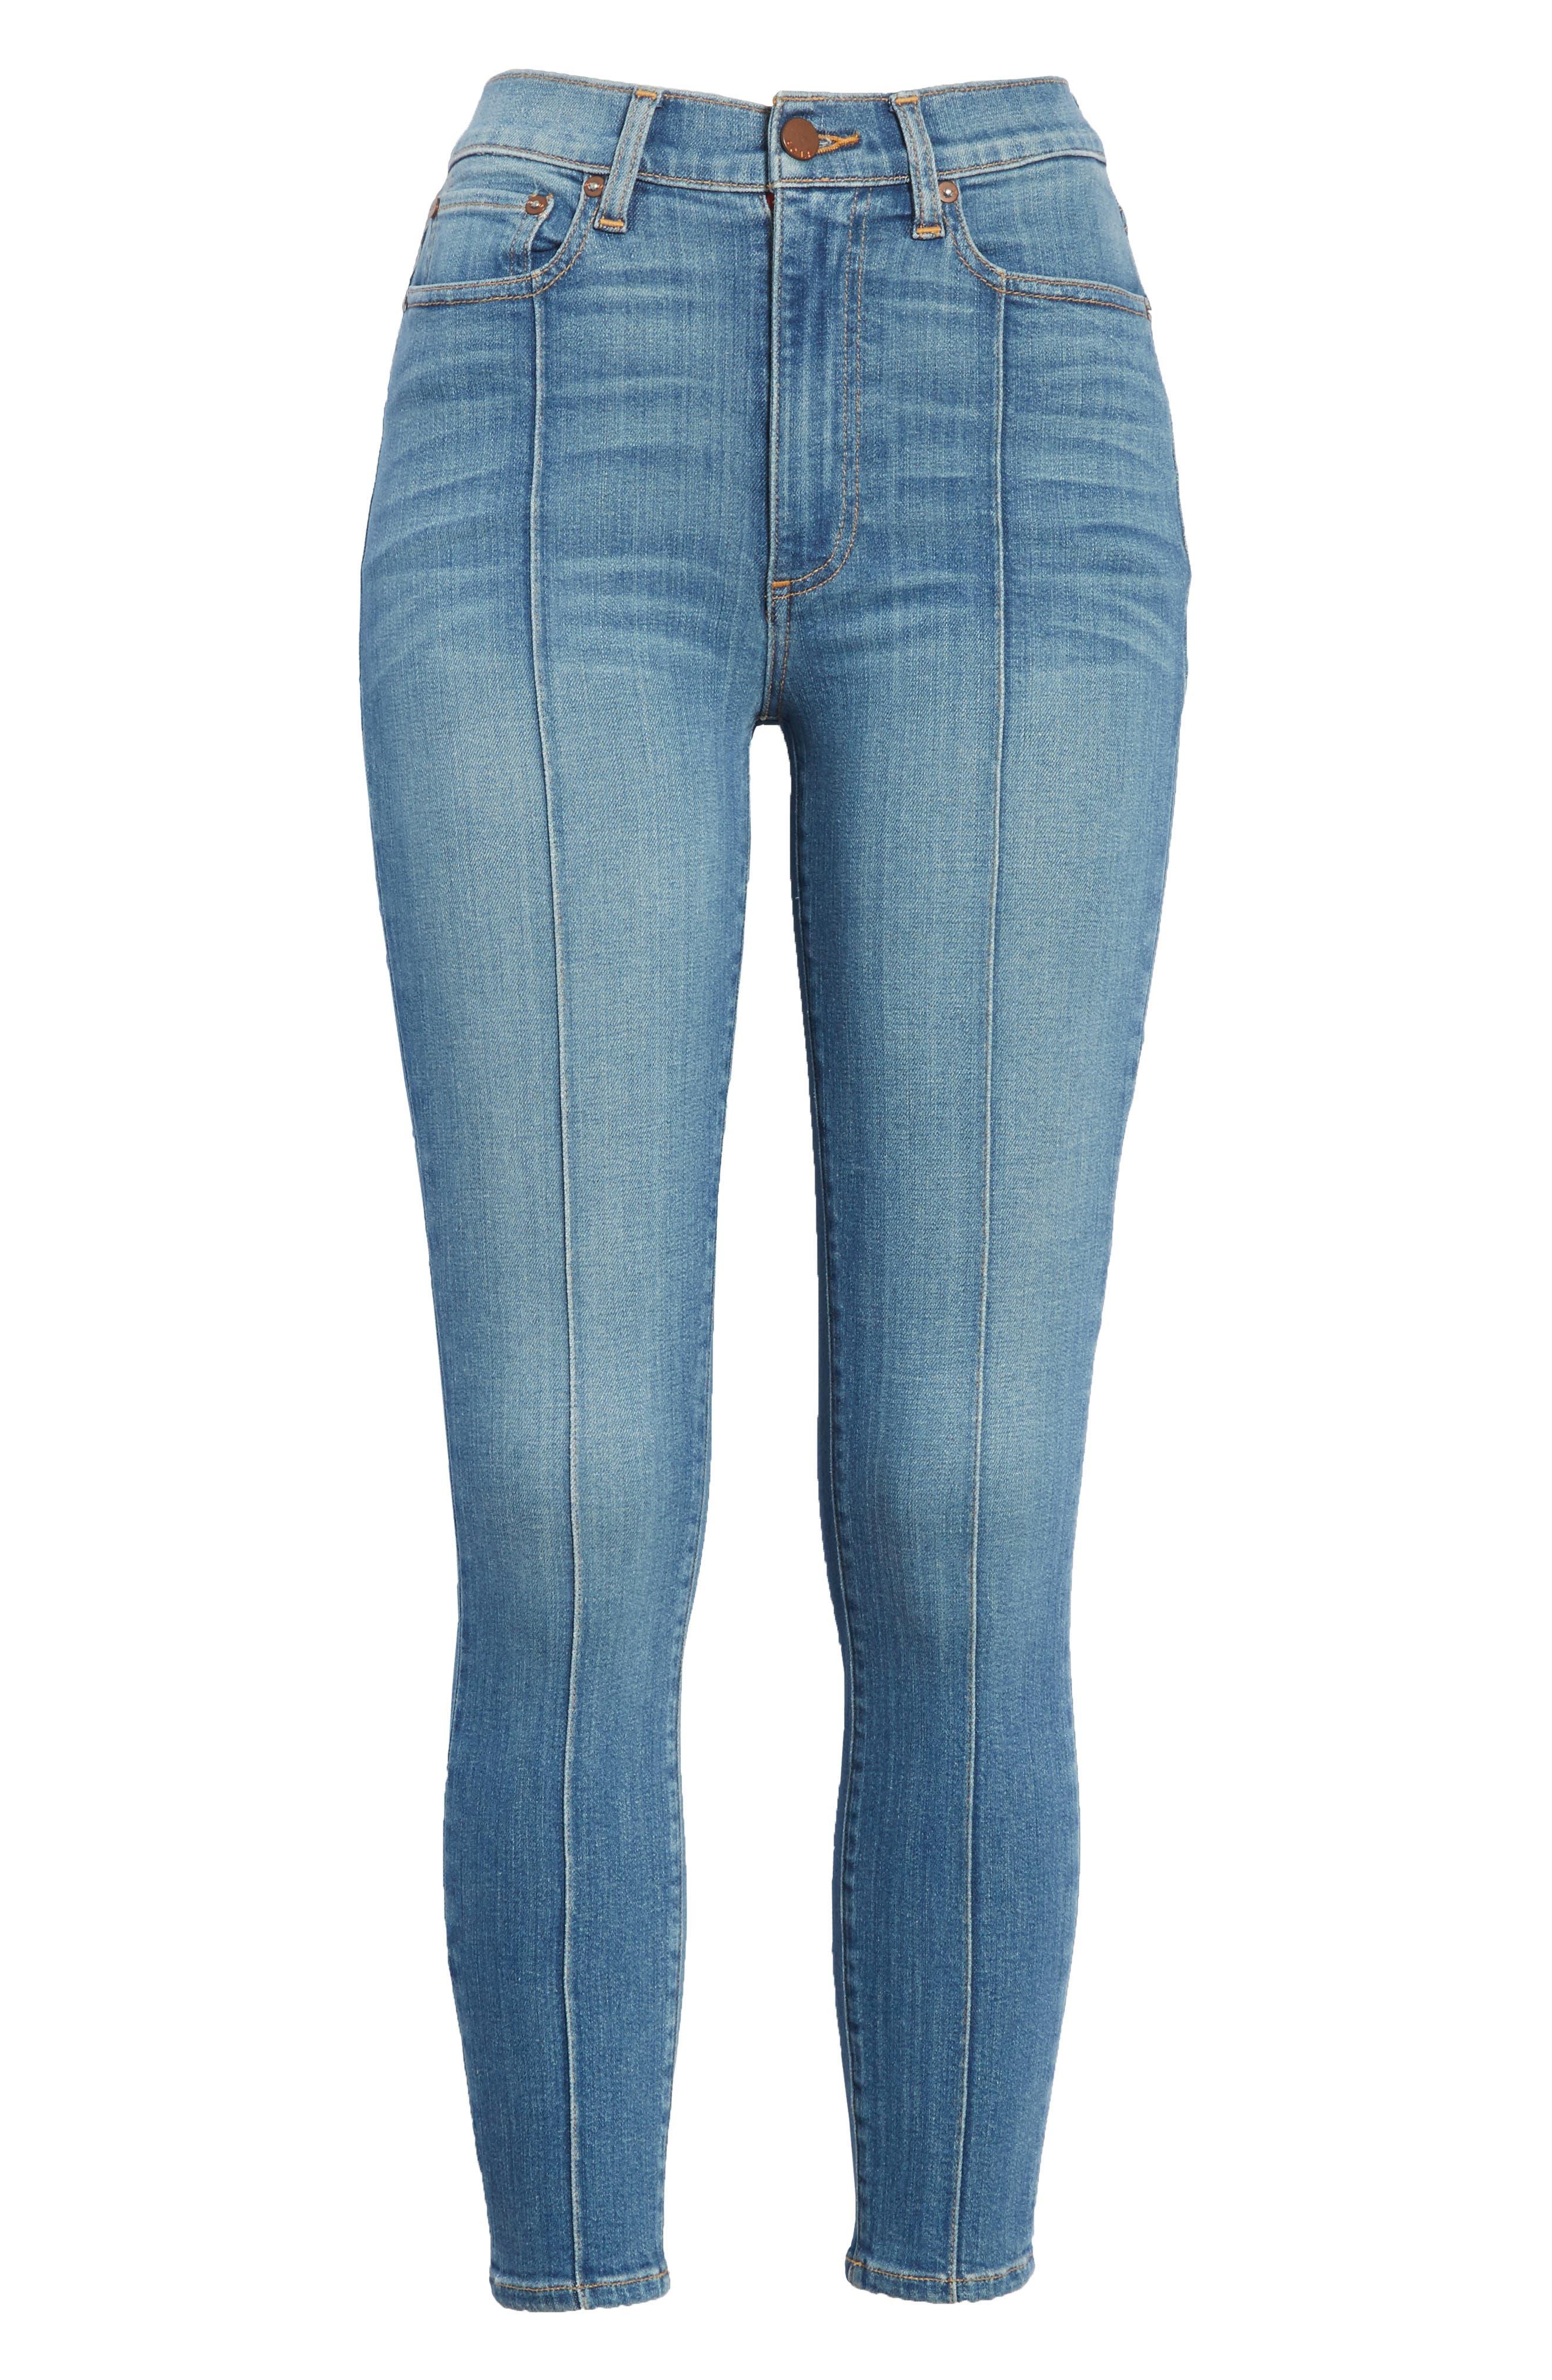 AO.LA Good High Waist Pintuck Skinny Jeans,                             Alternate thumbnail 6, color,                             Roadhouse Blues